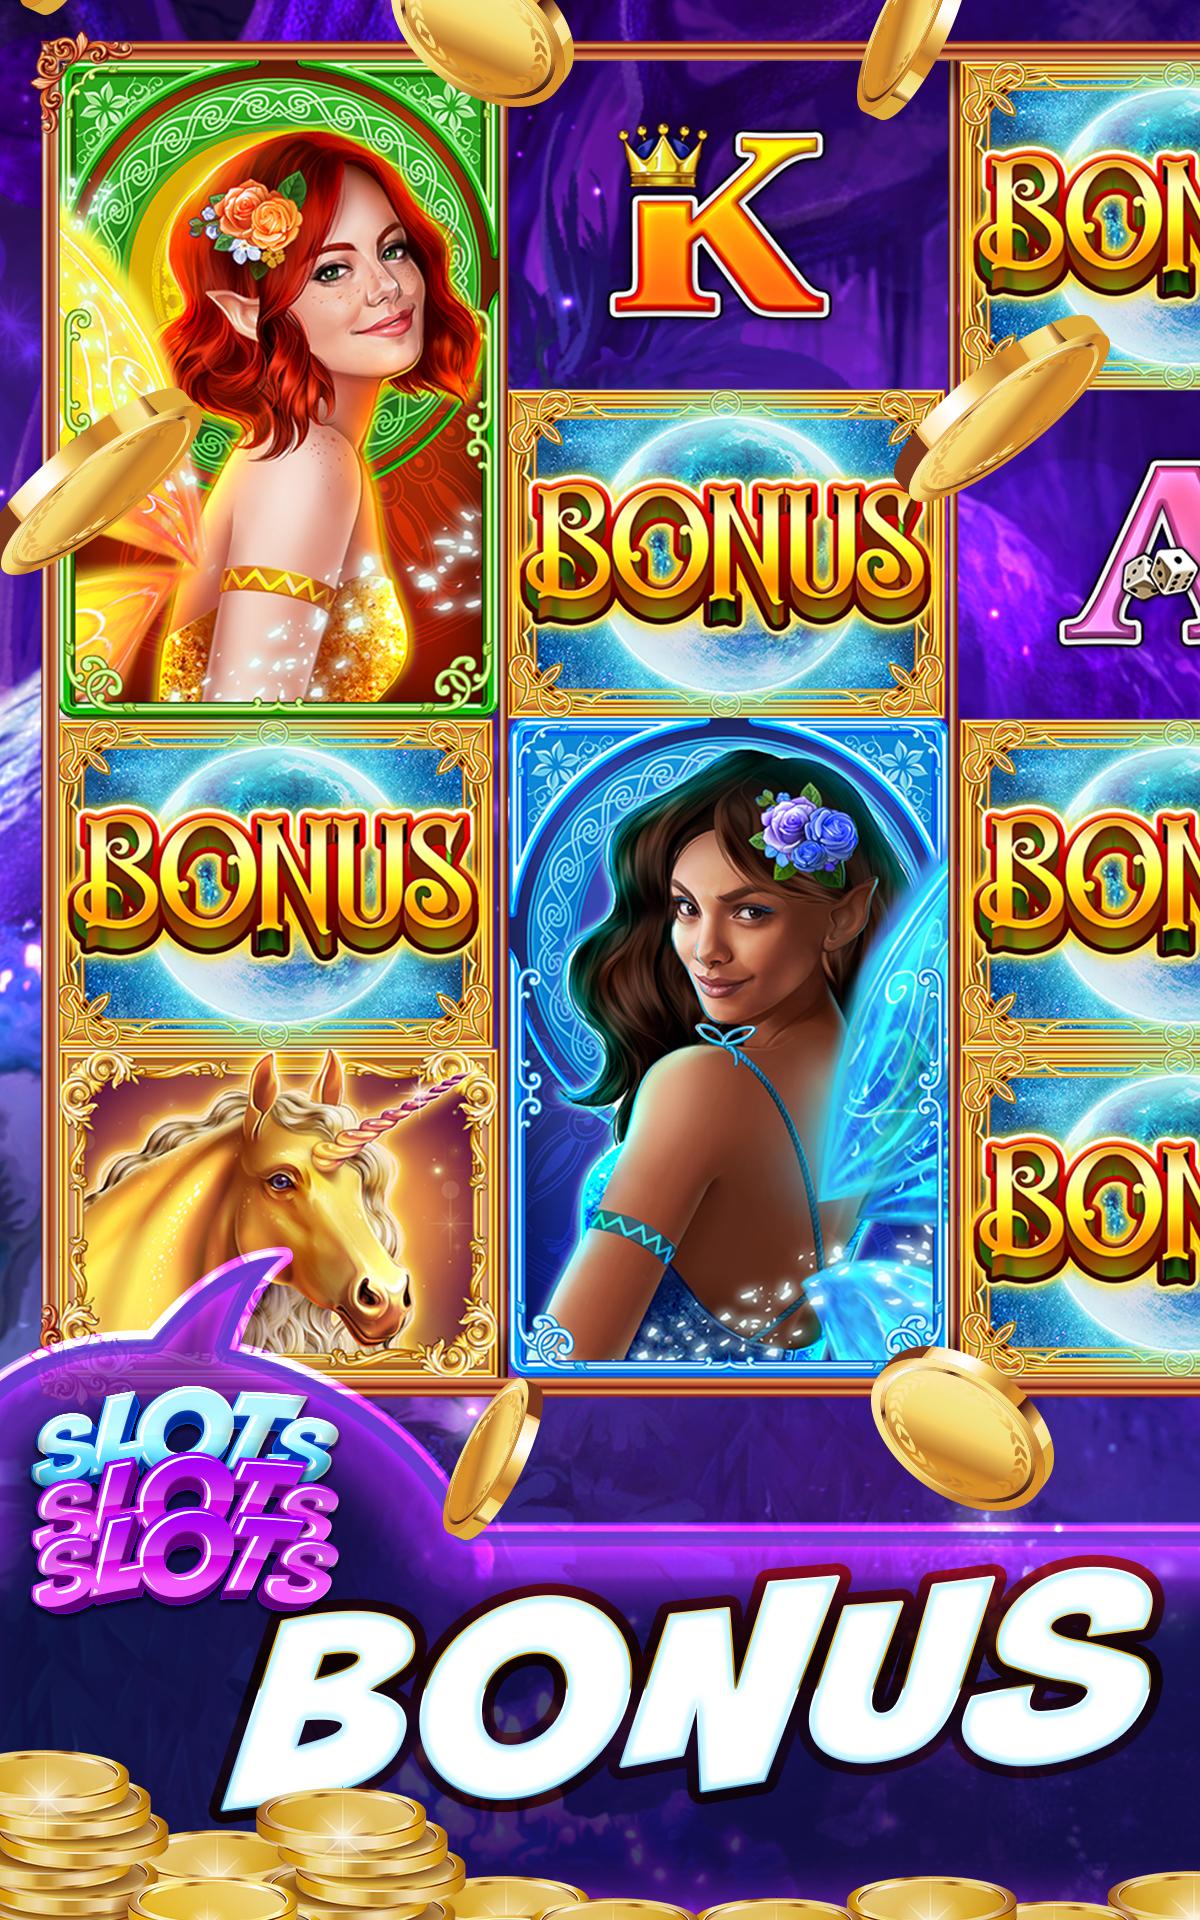 Billionaire casino - free slots games and poker